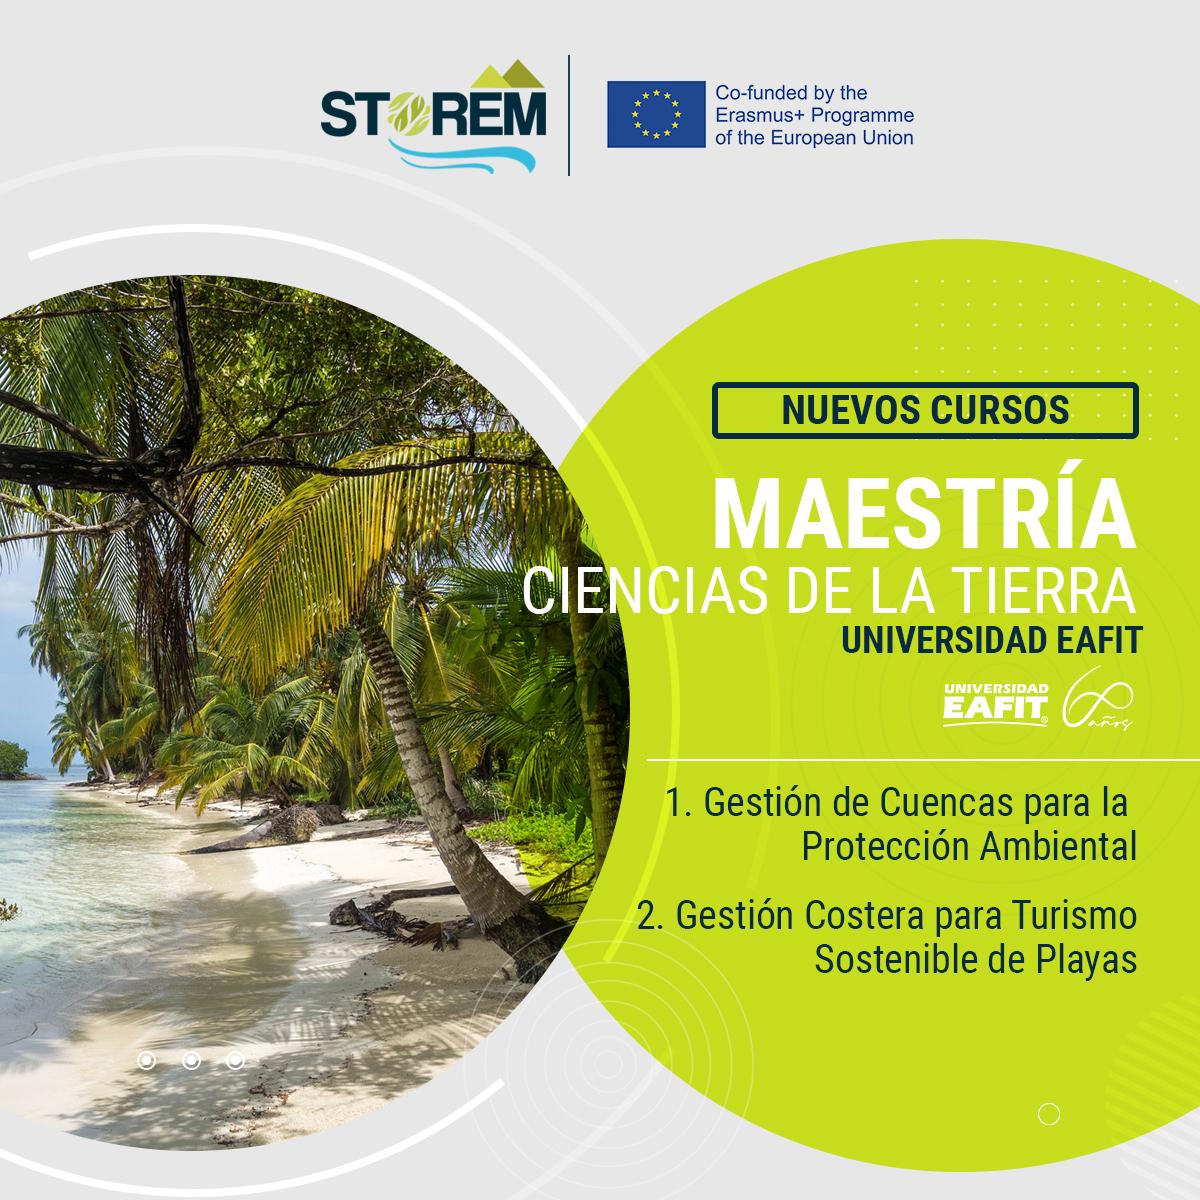 maestria de ciencias de la tierra EAFIT New courses at EAFIT in the STOREM pathway